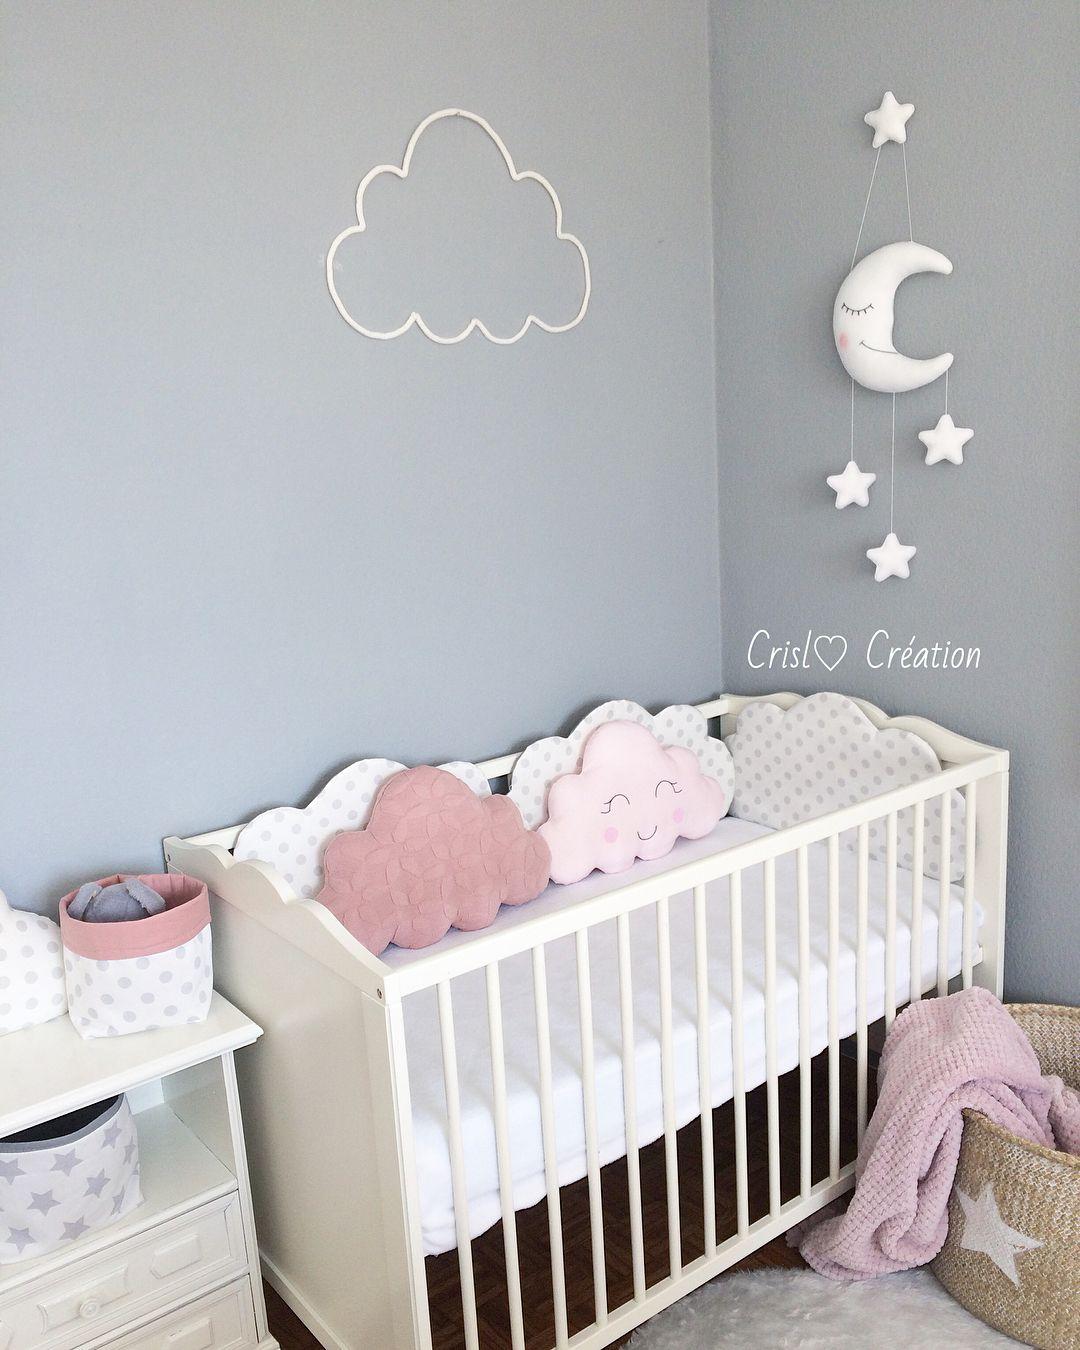 Épinglé par Veronika Ledniczki sur Nursery | Baby, Baby Room ...